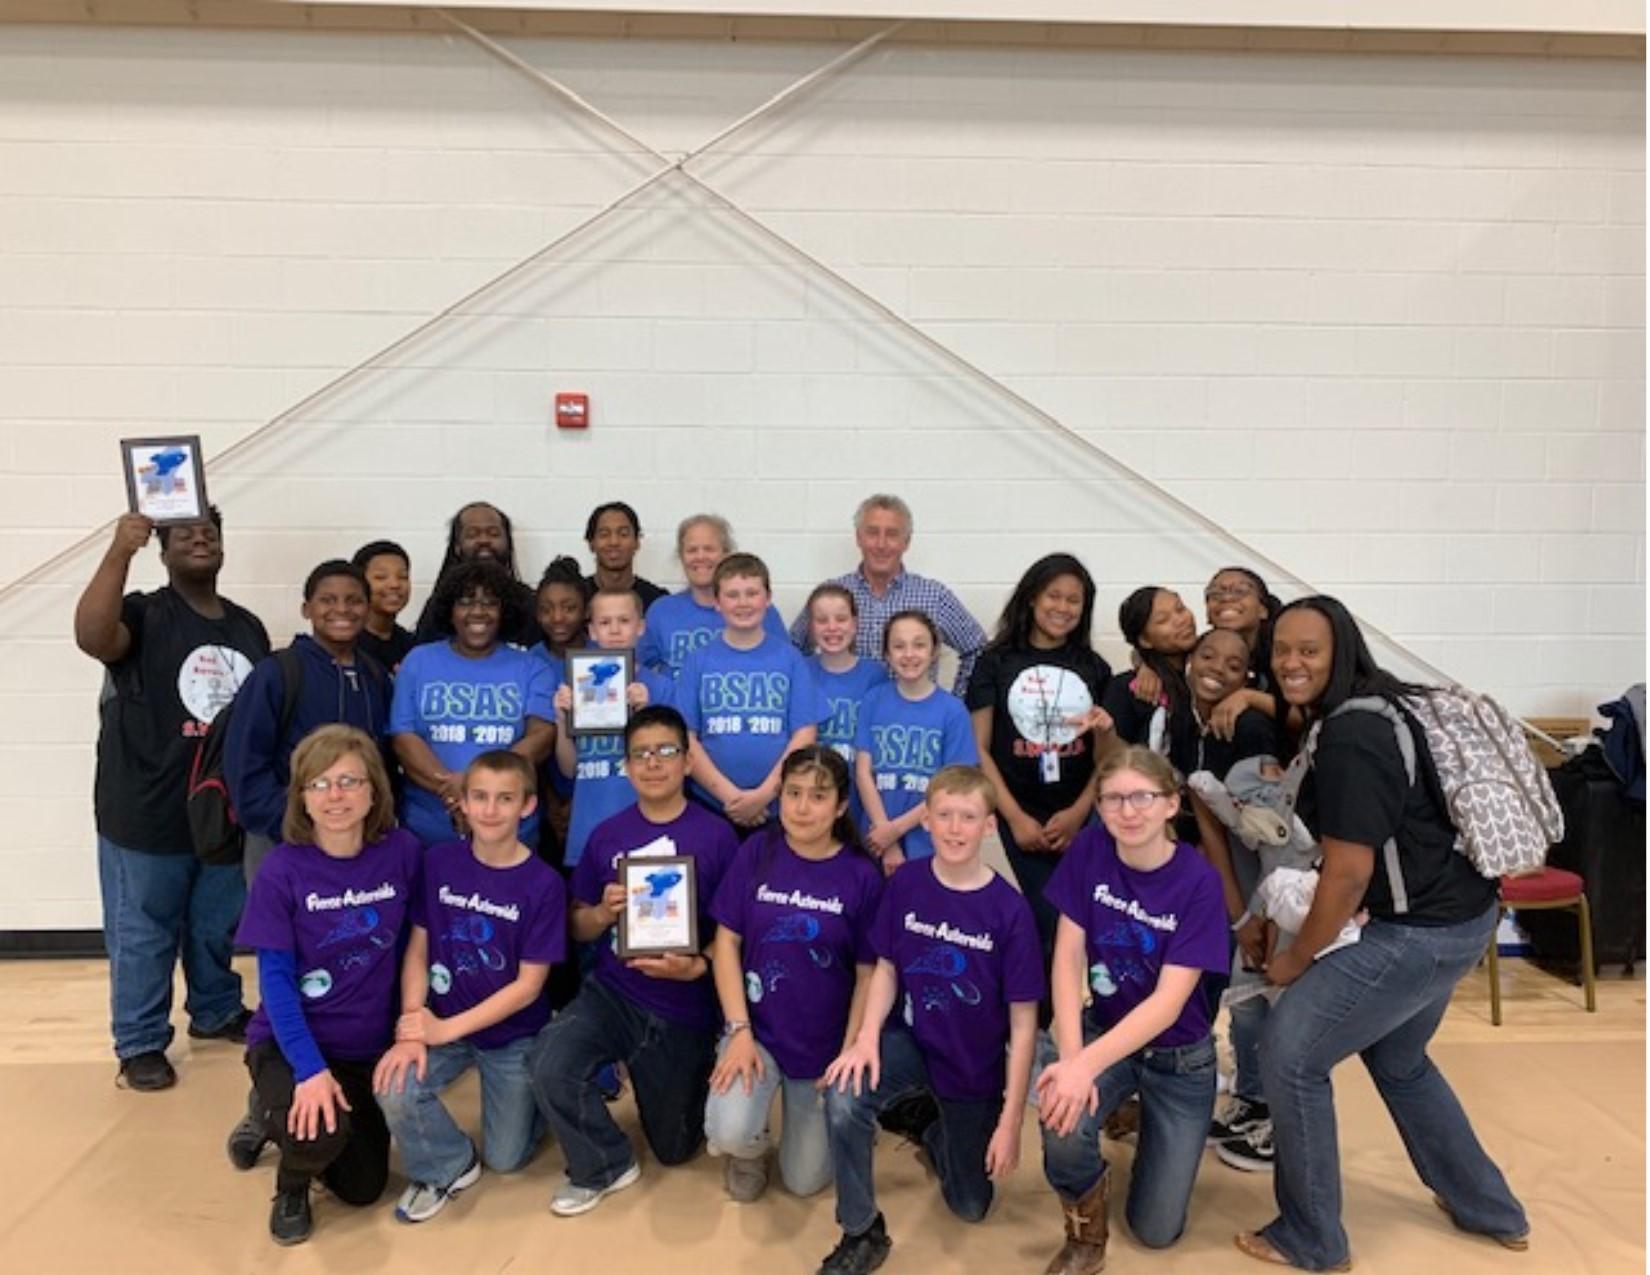 Lego Robotics 2019 Bentonville SDA School and Southwest Adventist Junior Academy